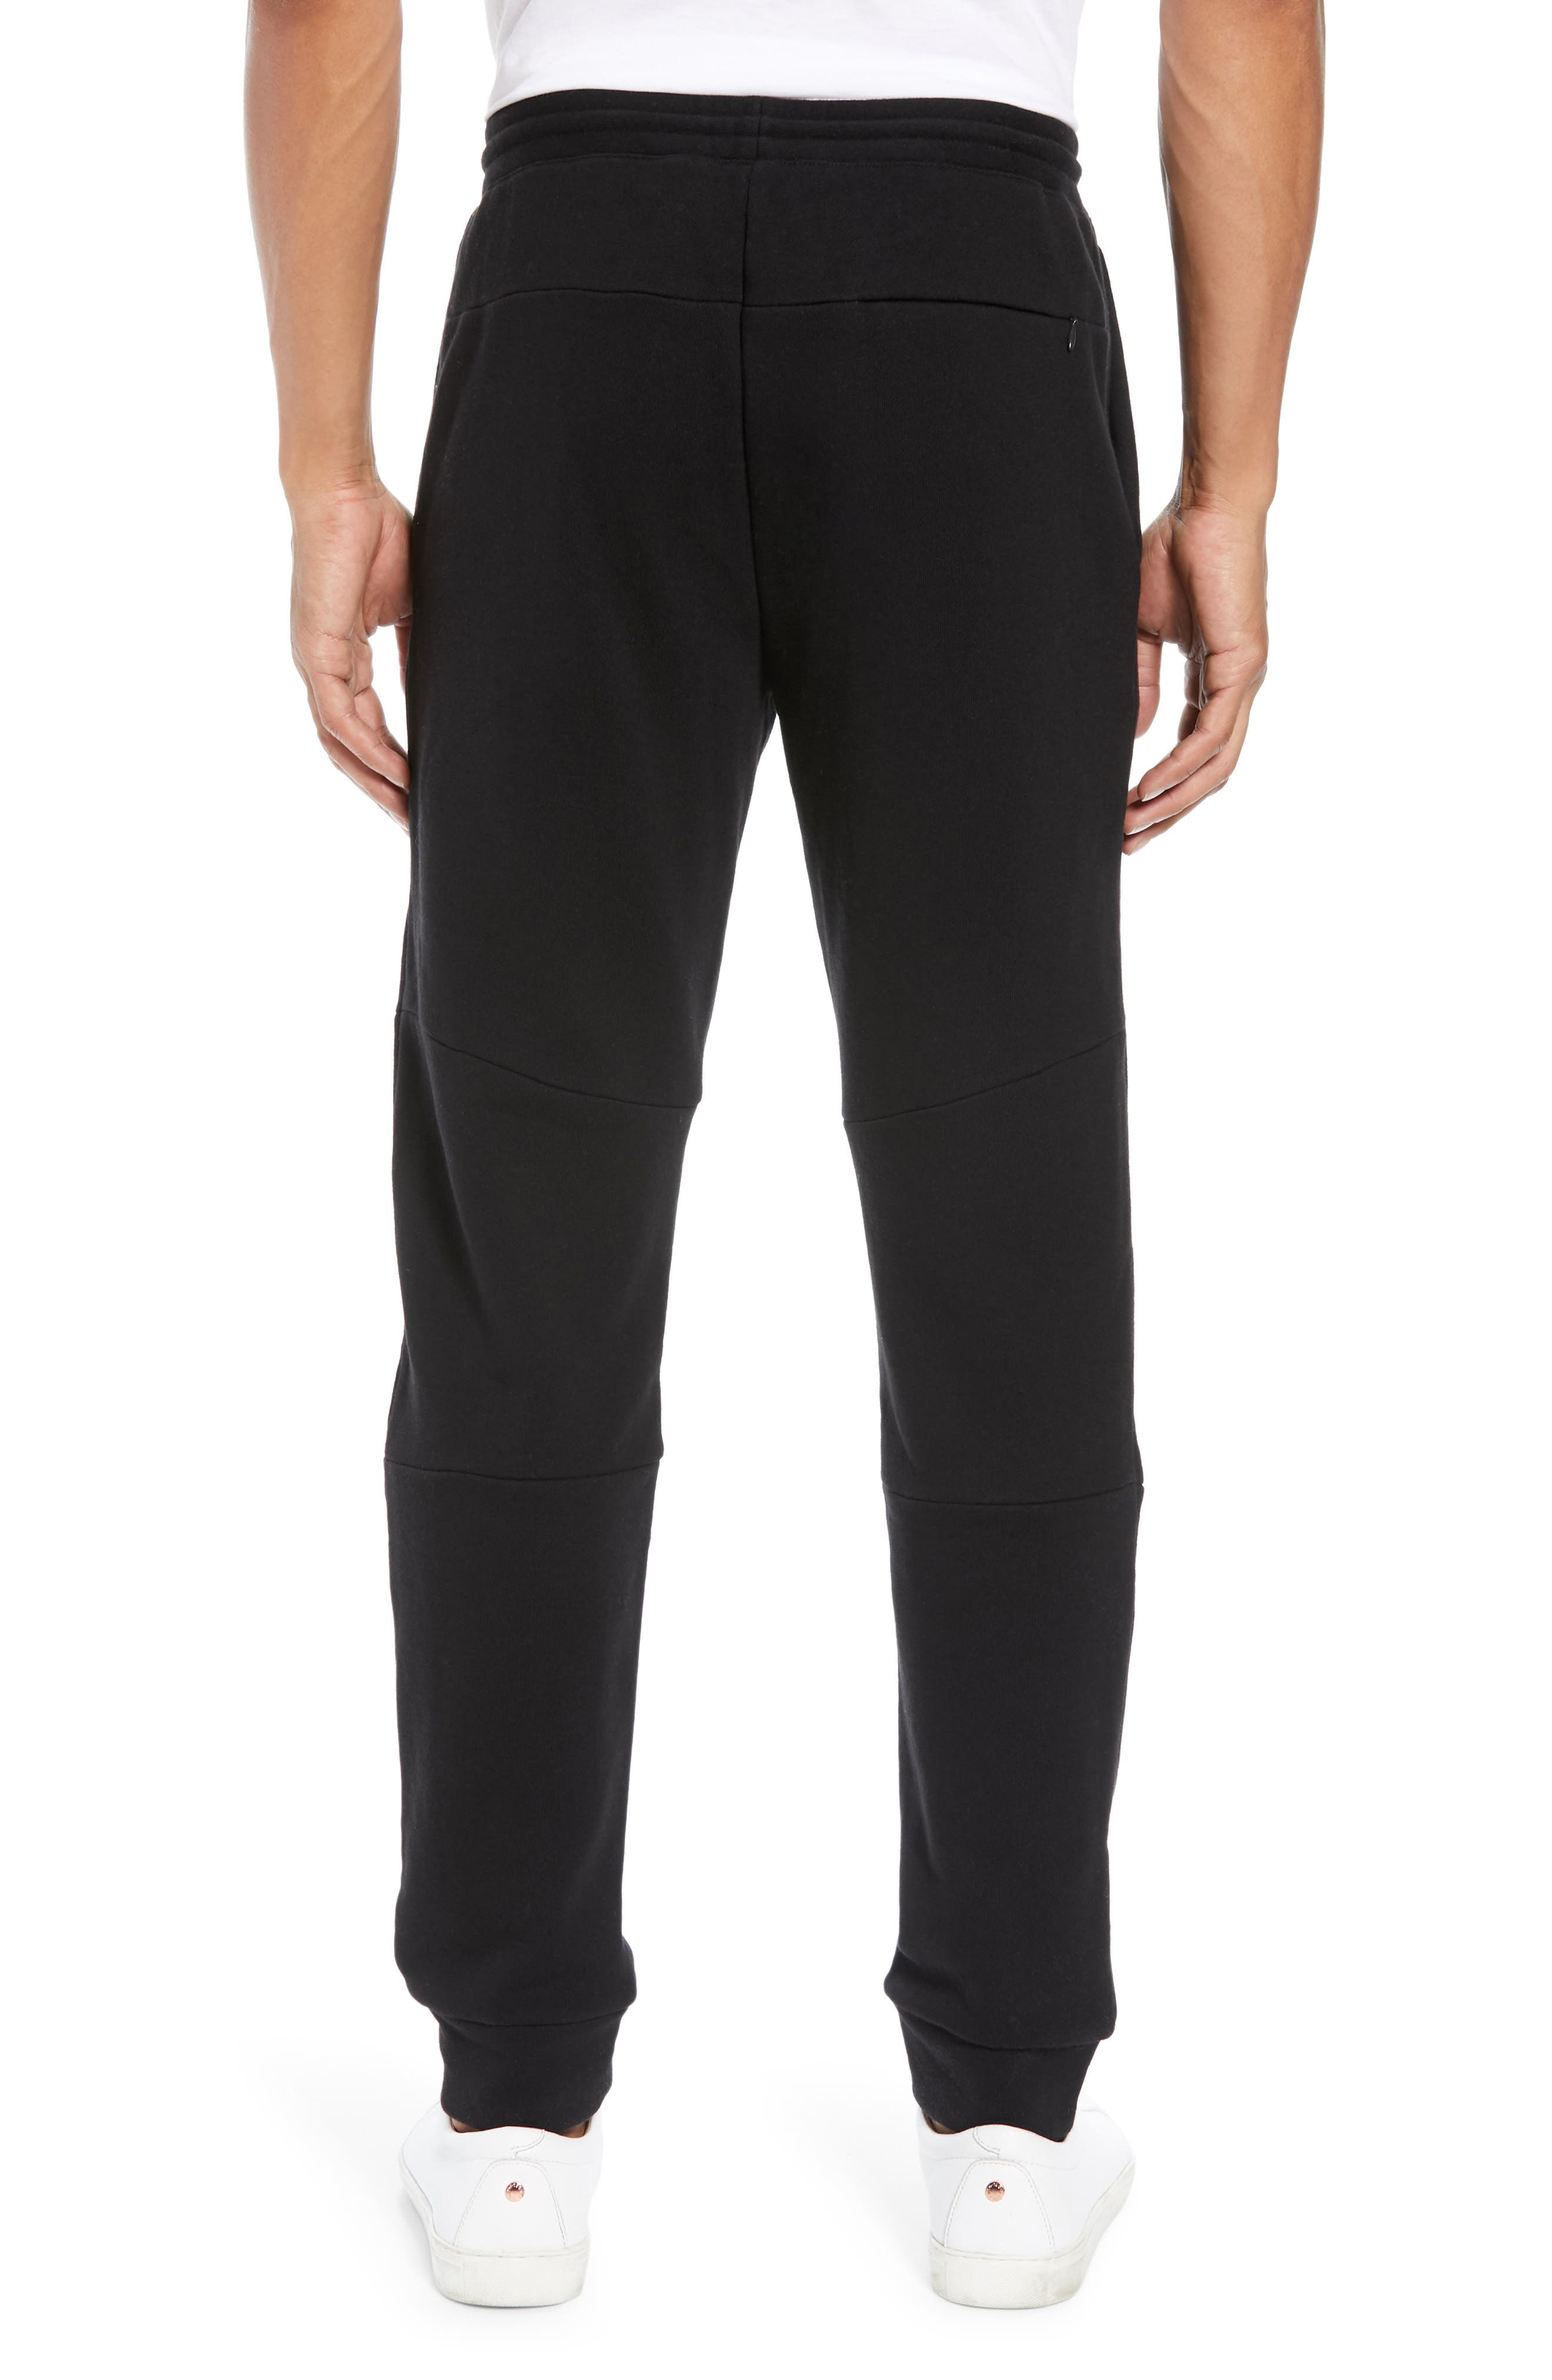 CLUB MONACO,                             Articulated Seam Jogger Pants,                             Alternate thumbnail 2, color,                             001